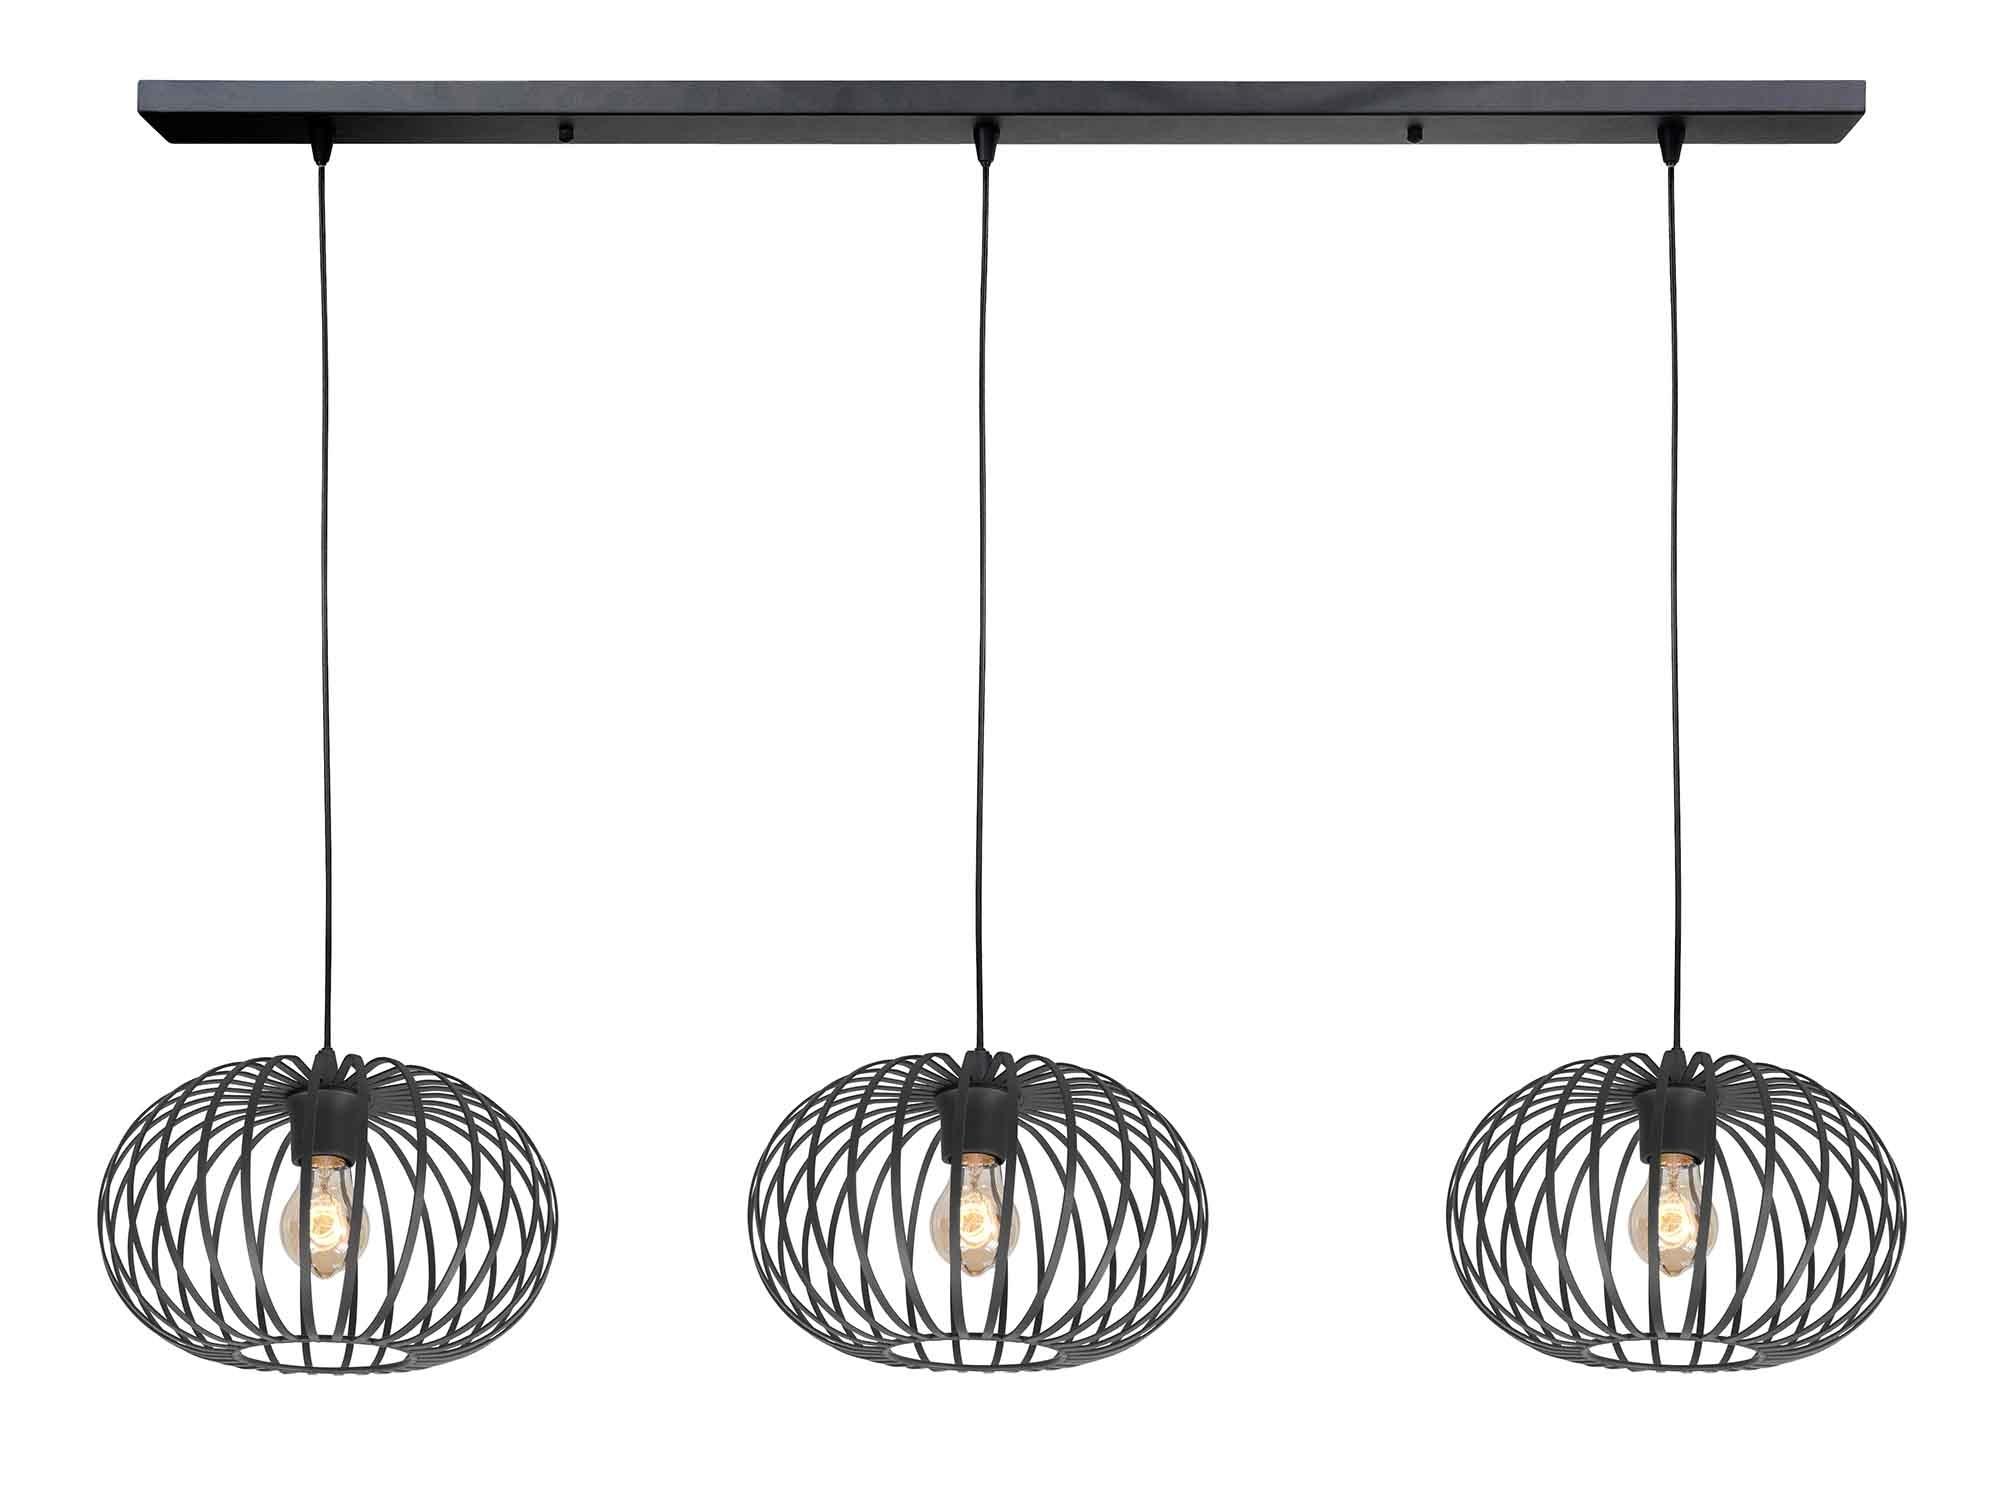 Highlight Hanglamp Bolato 3 lichts L 140 cm Ø 30 cm zwart